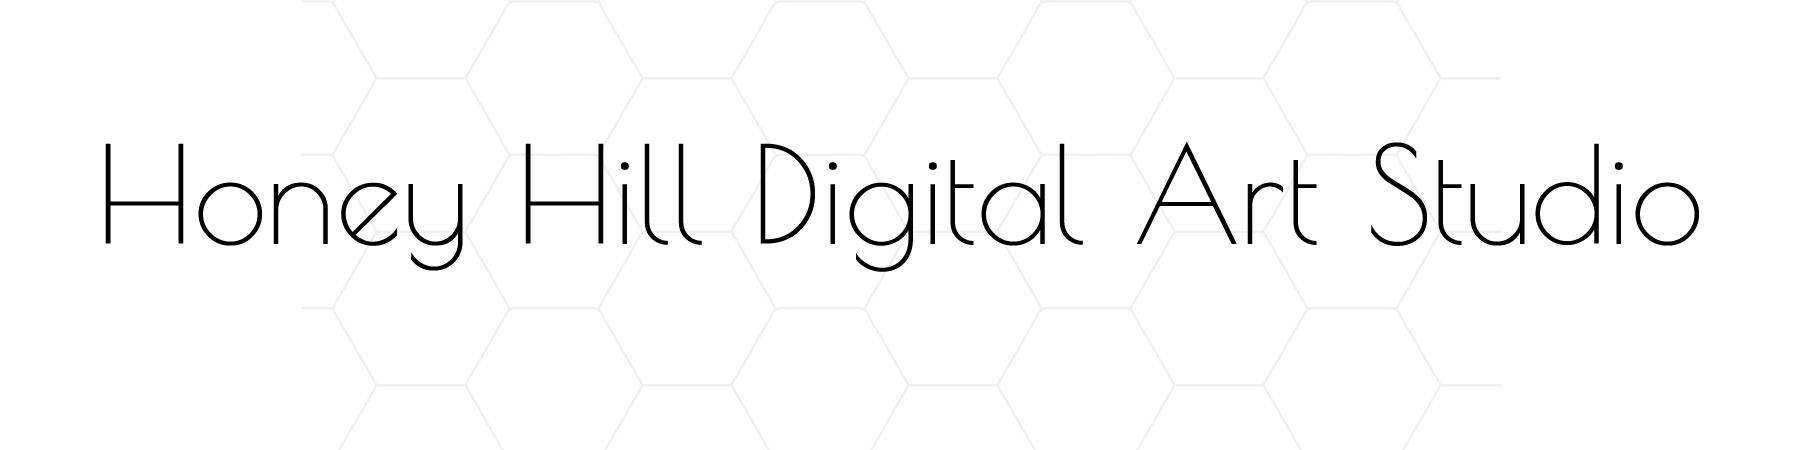 Honey Hill Digital Art Studio Goldsboro, NC Photographer & Digital Artist